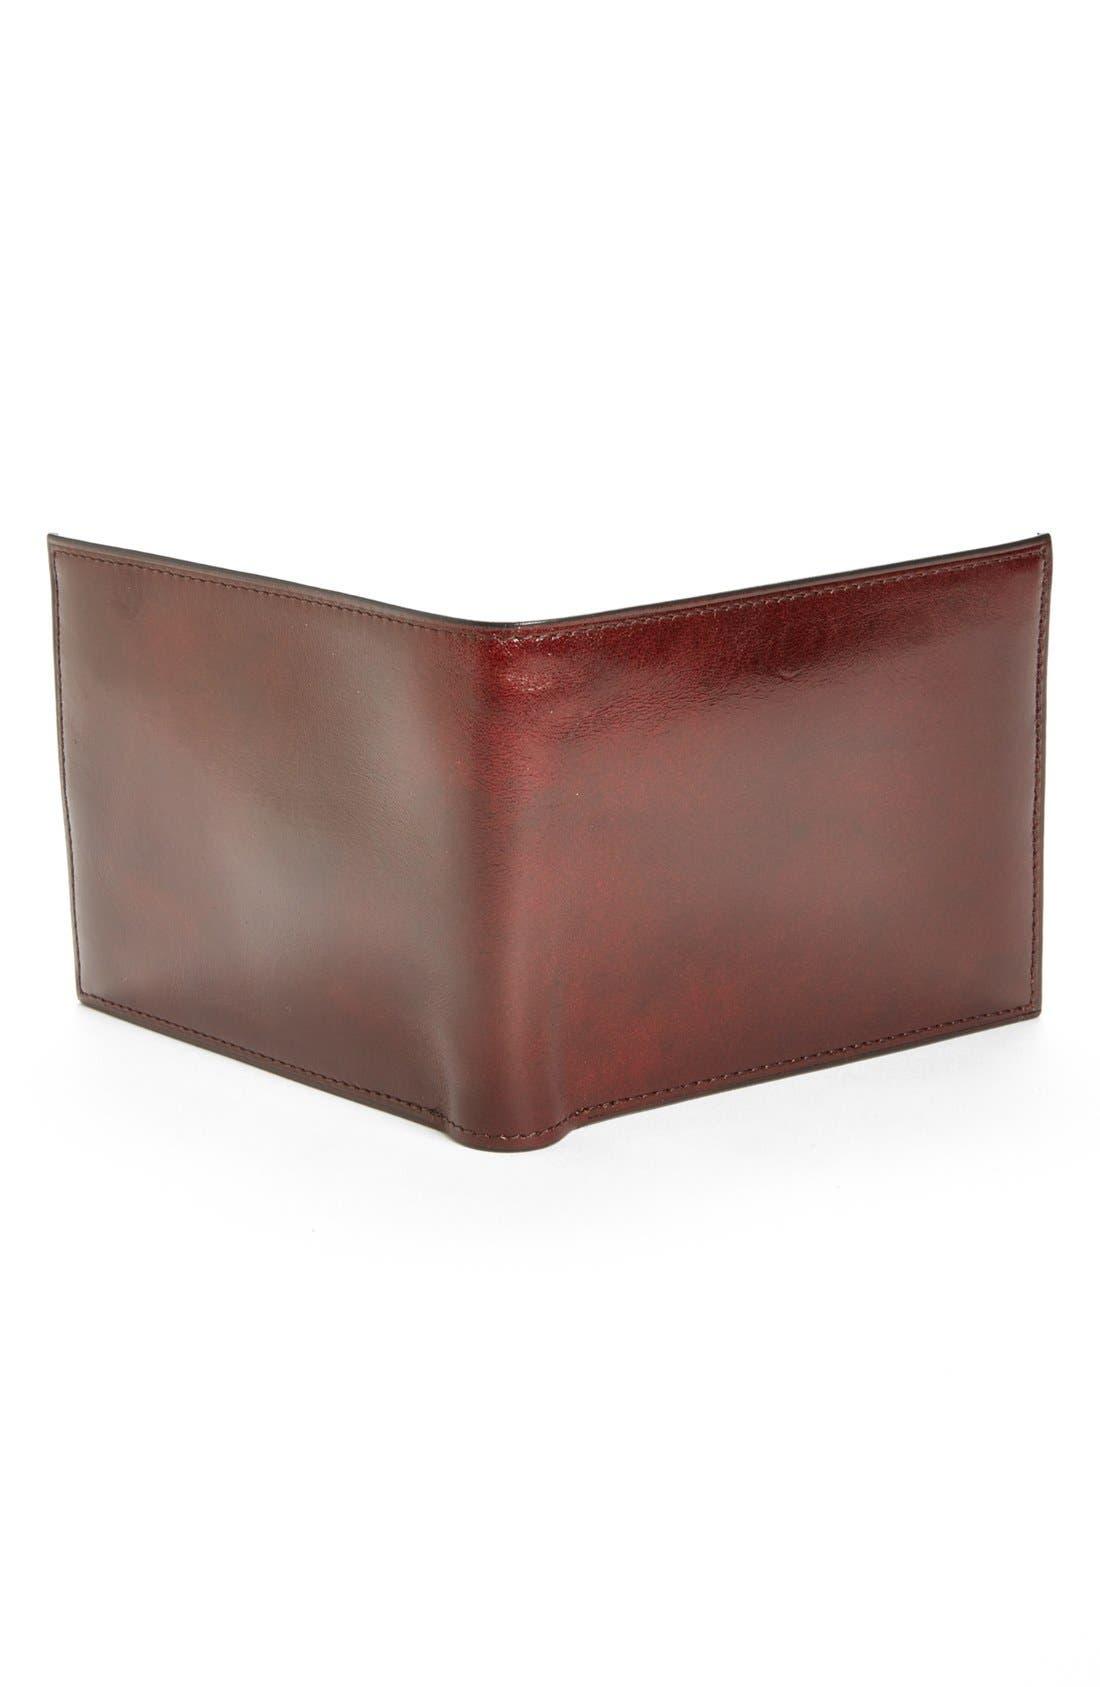 BOSCA, ID Flap Leather Wallet, Alternate thumbnail 2, color, DARK BROWN